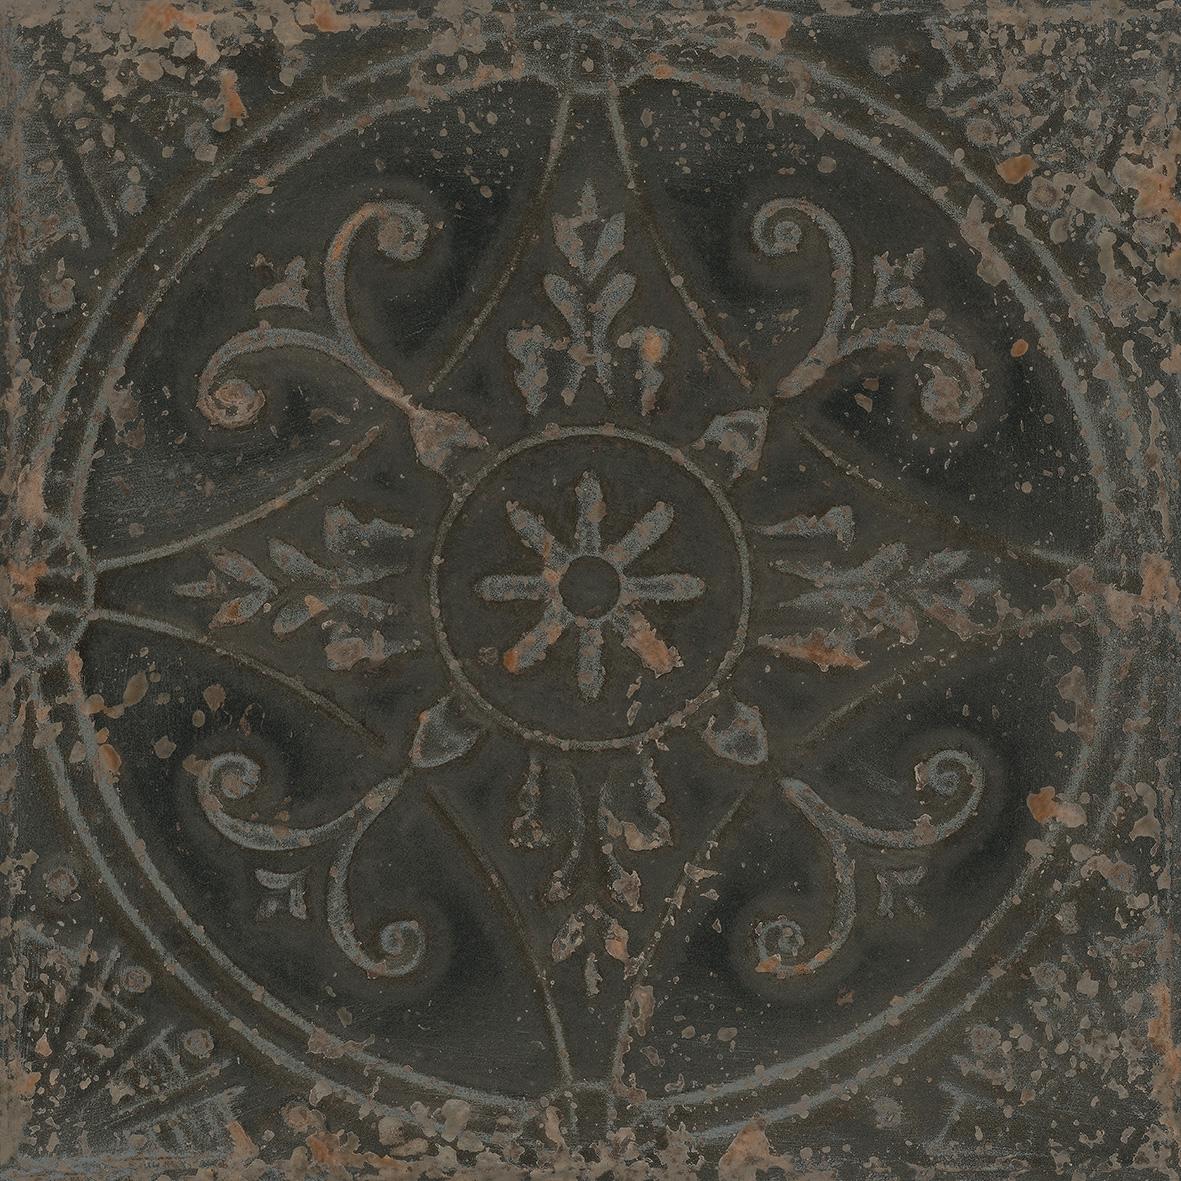 klinker peronda fs saja n 33x33 kakel online tiles r us ab. Black Bedroom Furniture Sets. Home Design Ideas